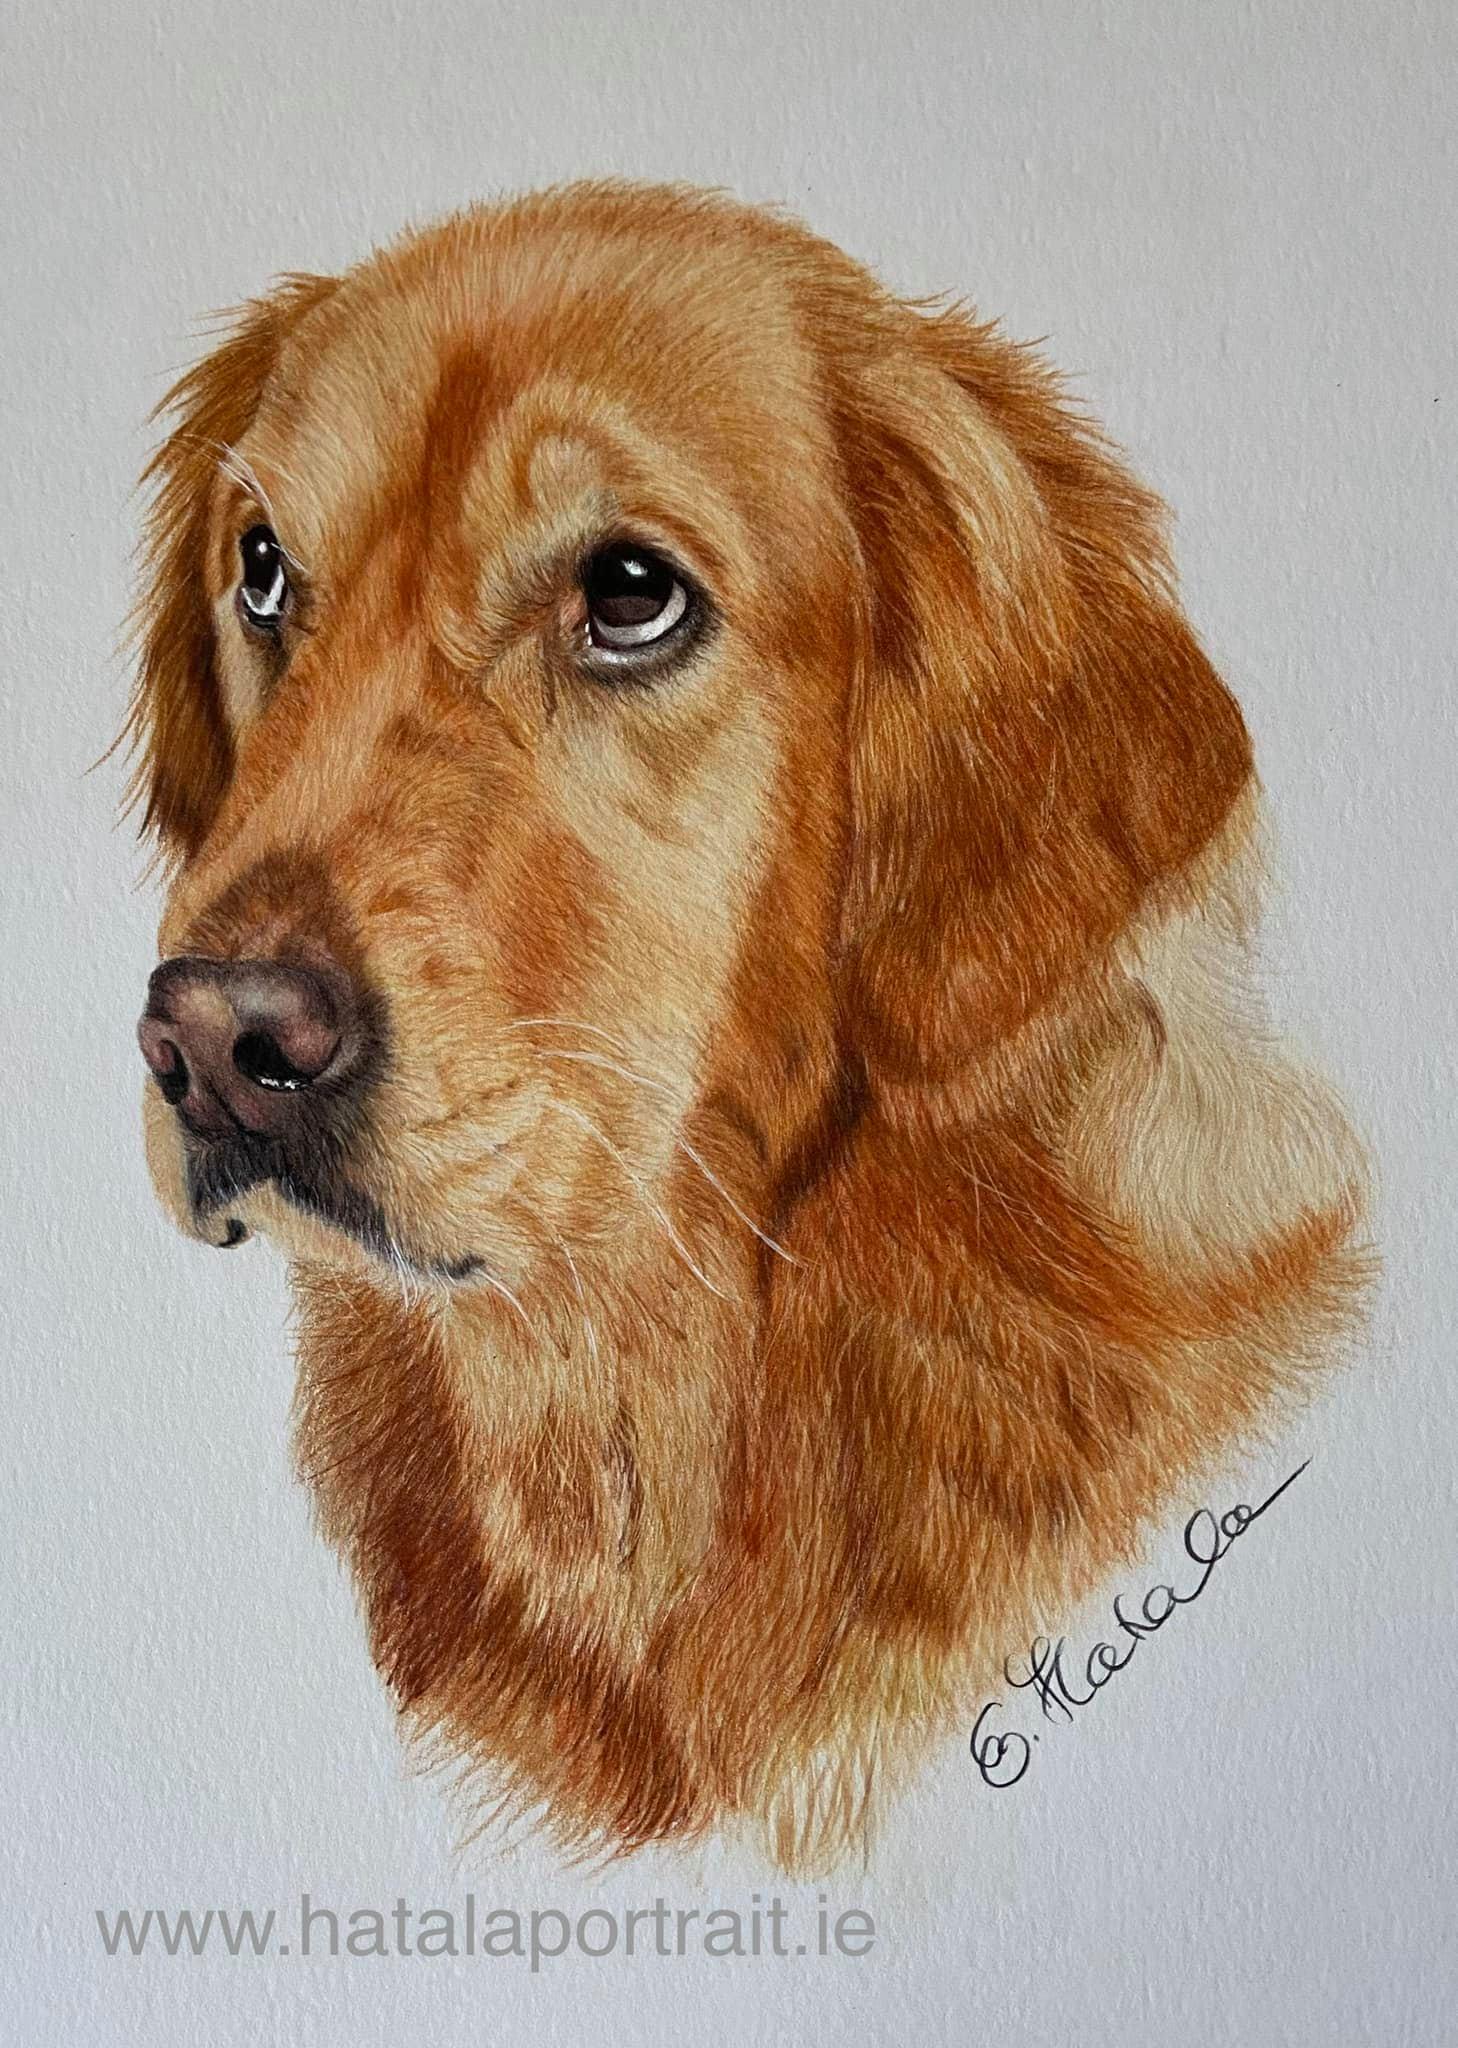 Pet portrait from photo Image